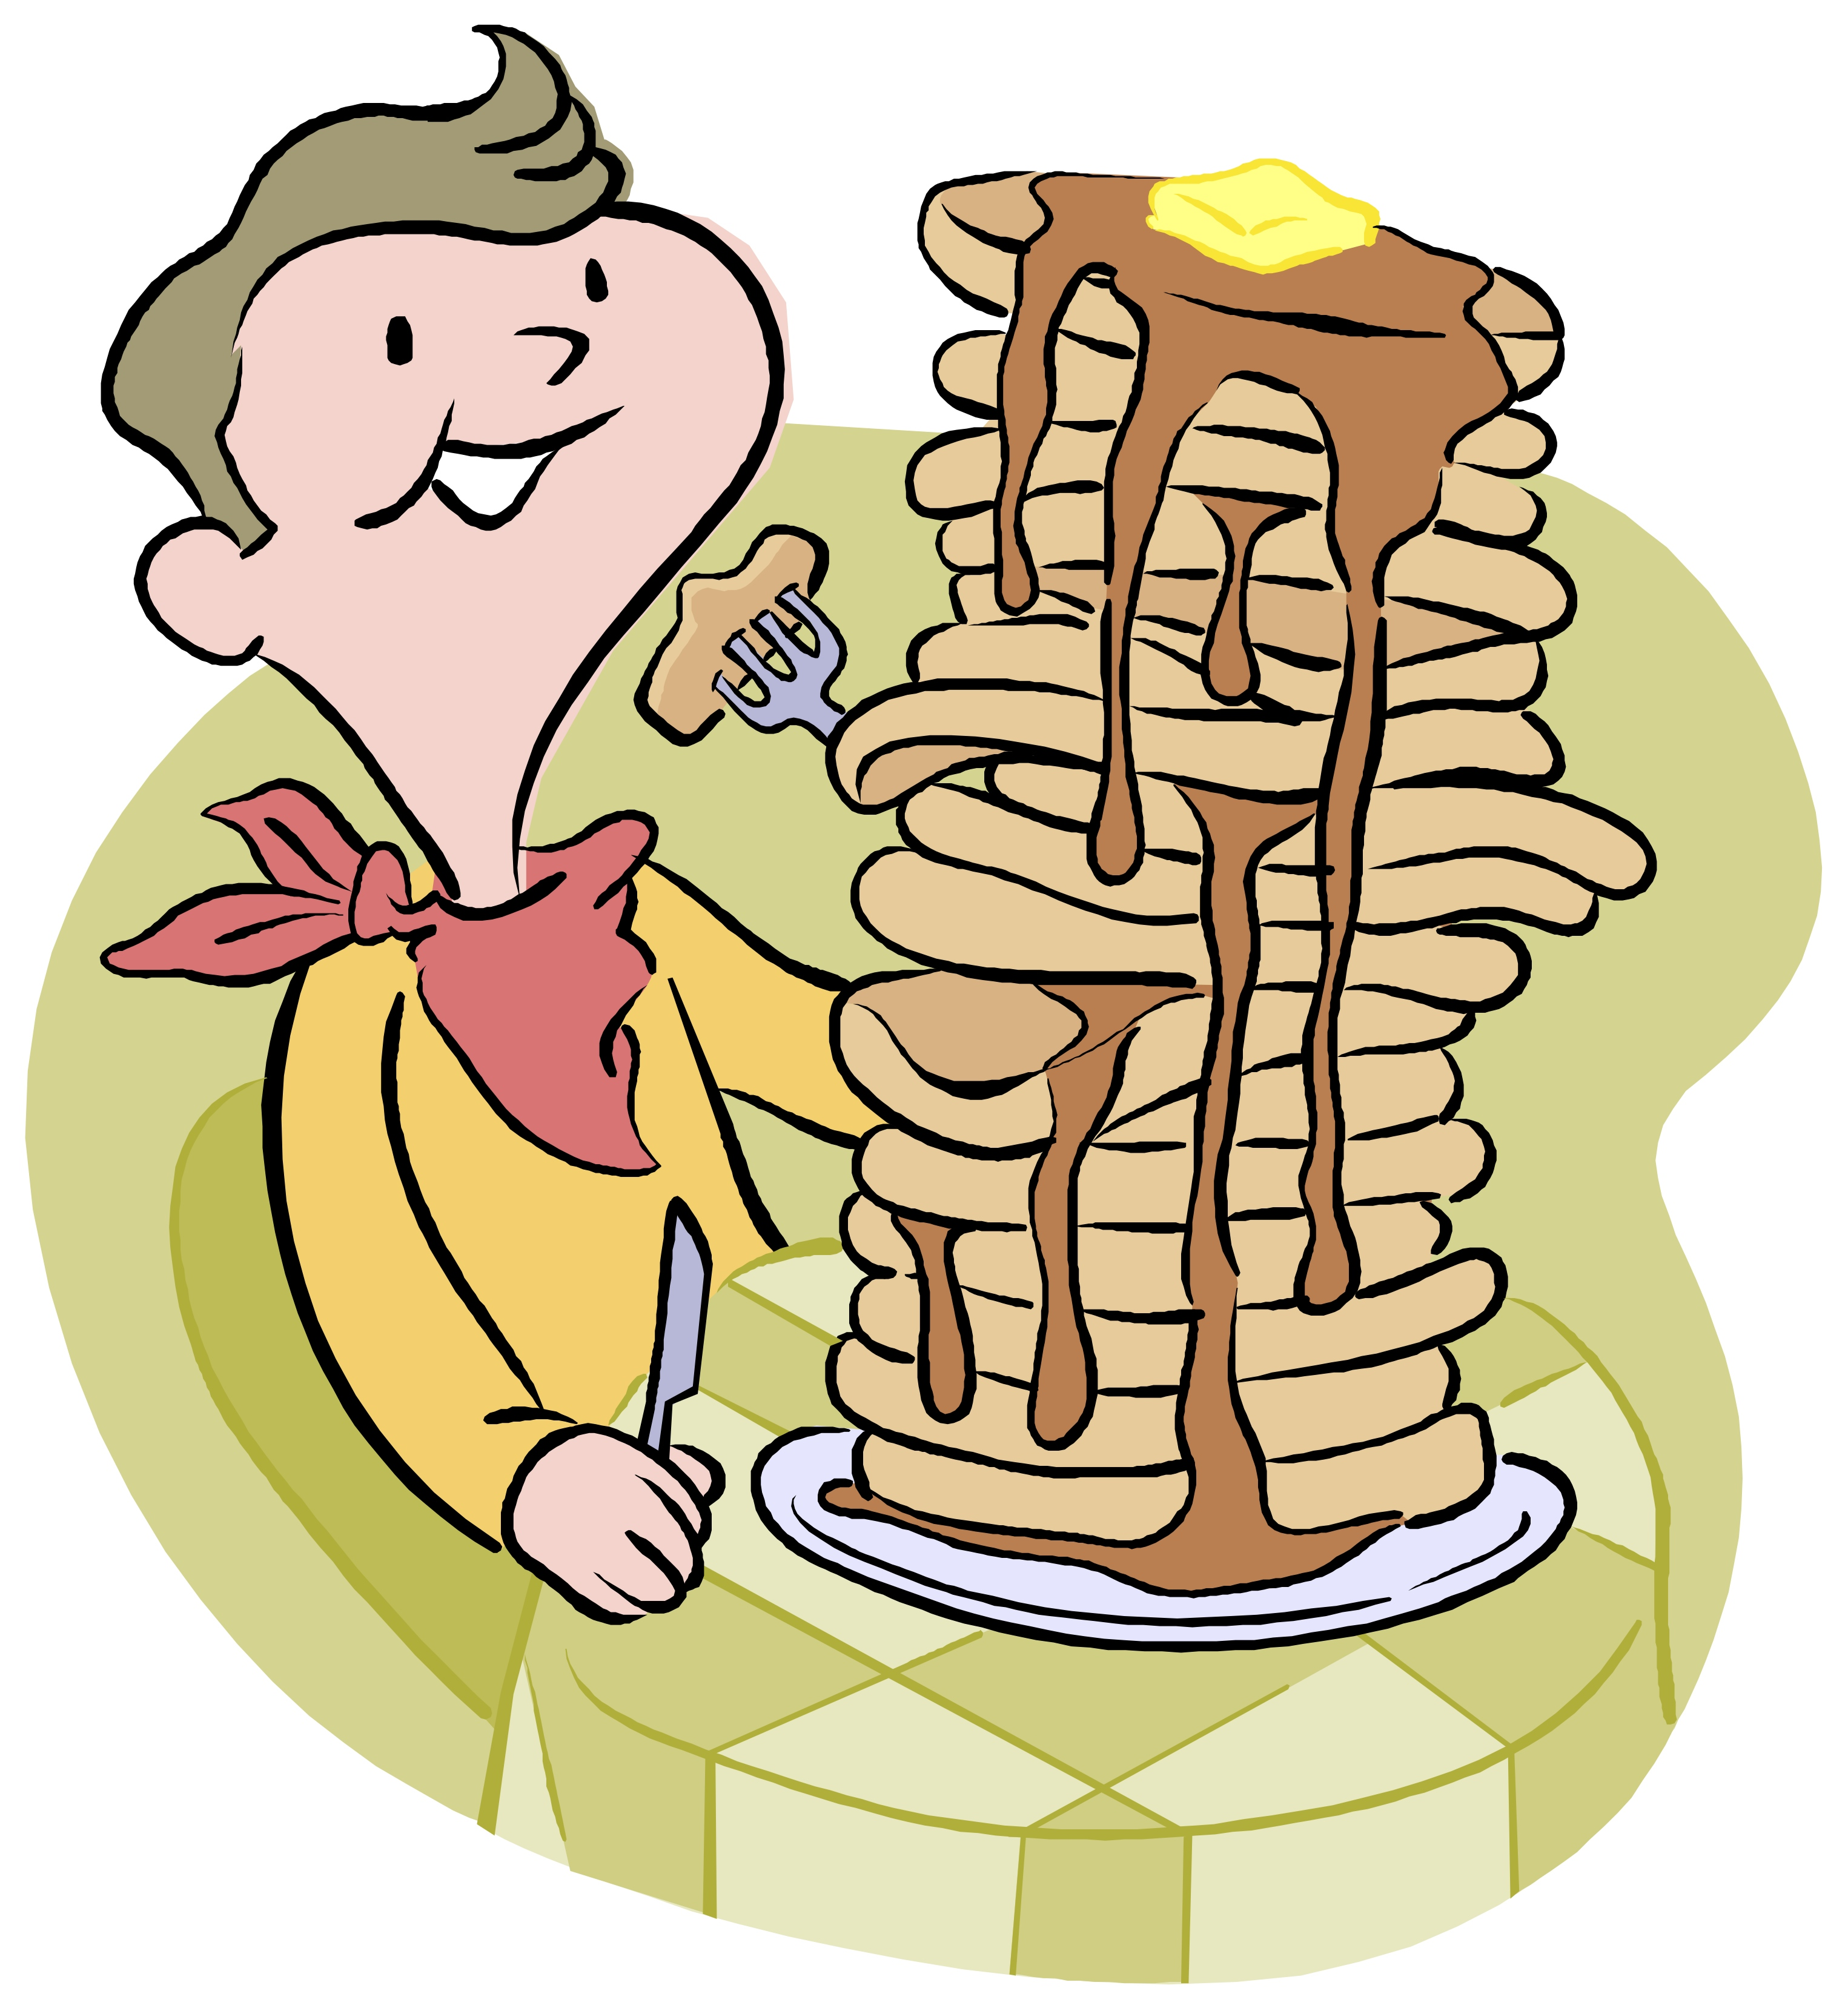 Boy Eating Pancakes Clipart.